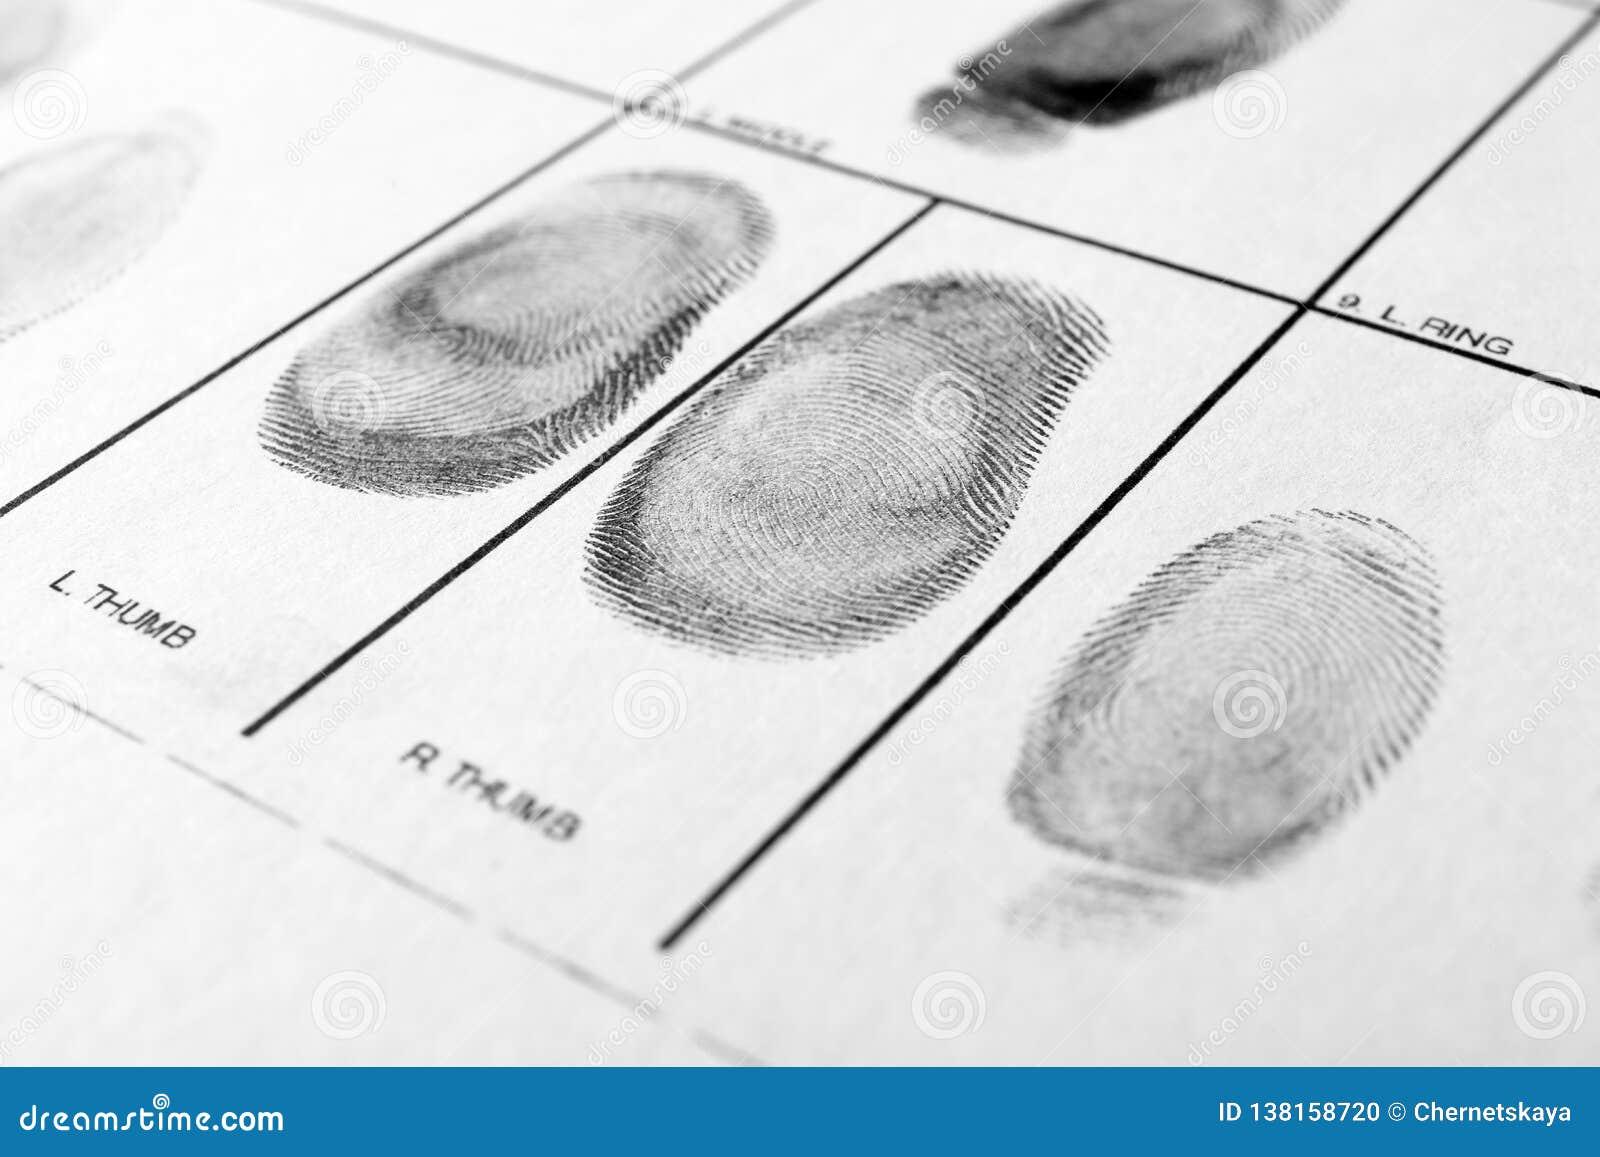 Police Form With Fingerprints Forensic Examination Stock Photo Image Of Detective Fingerprint 138158720